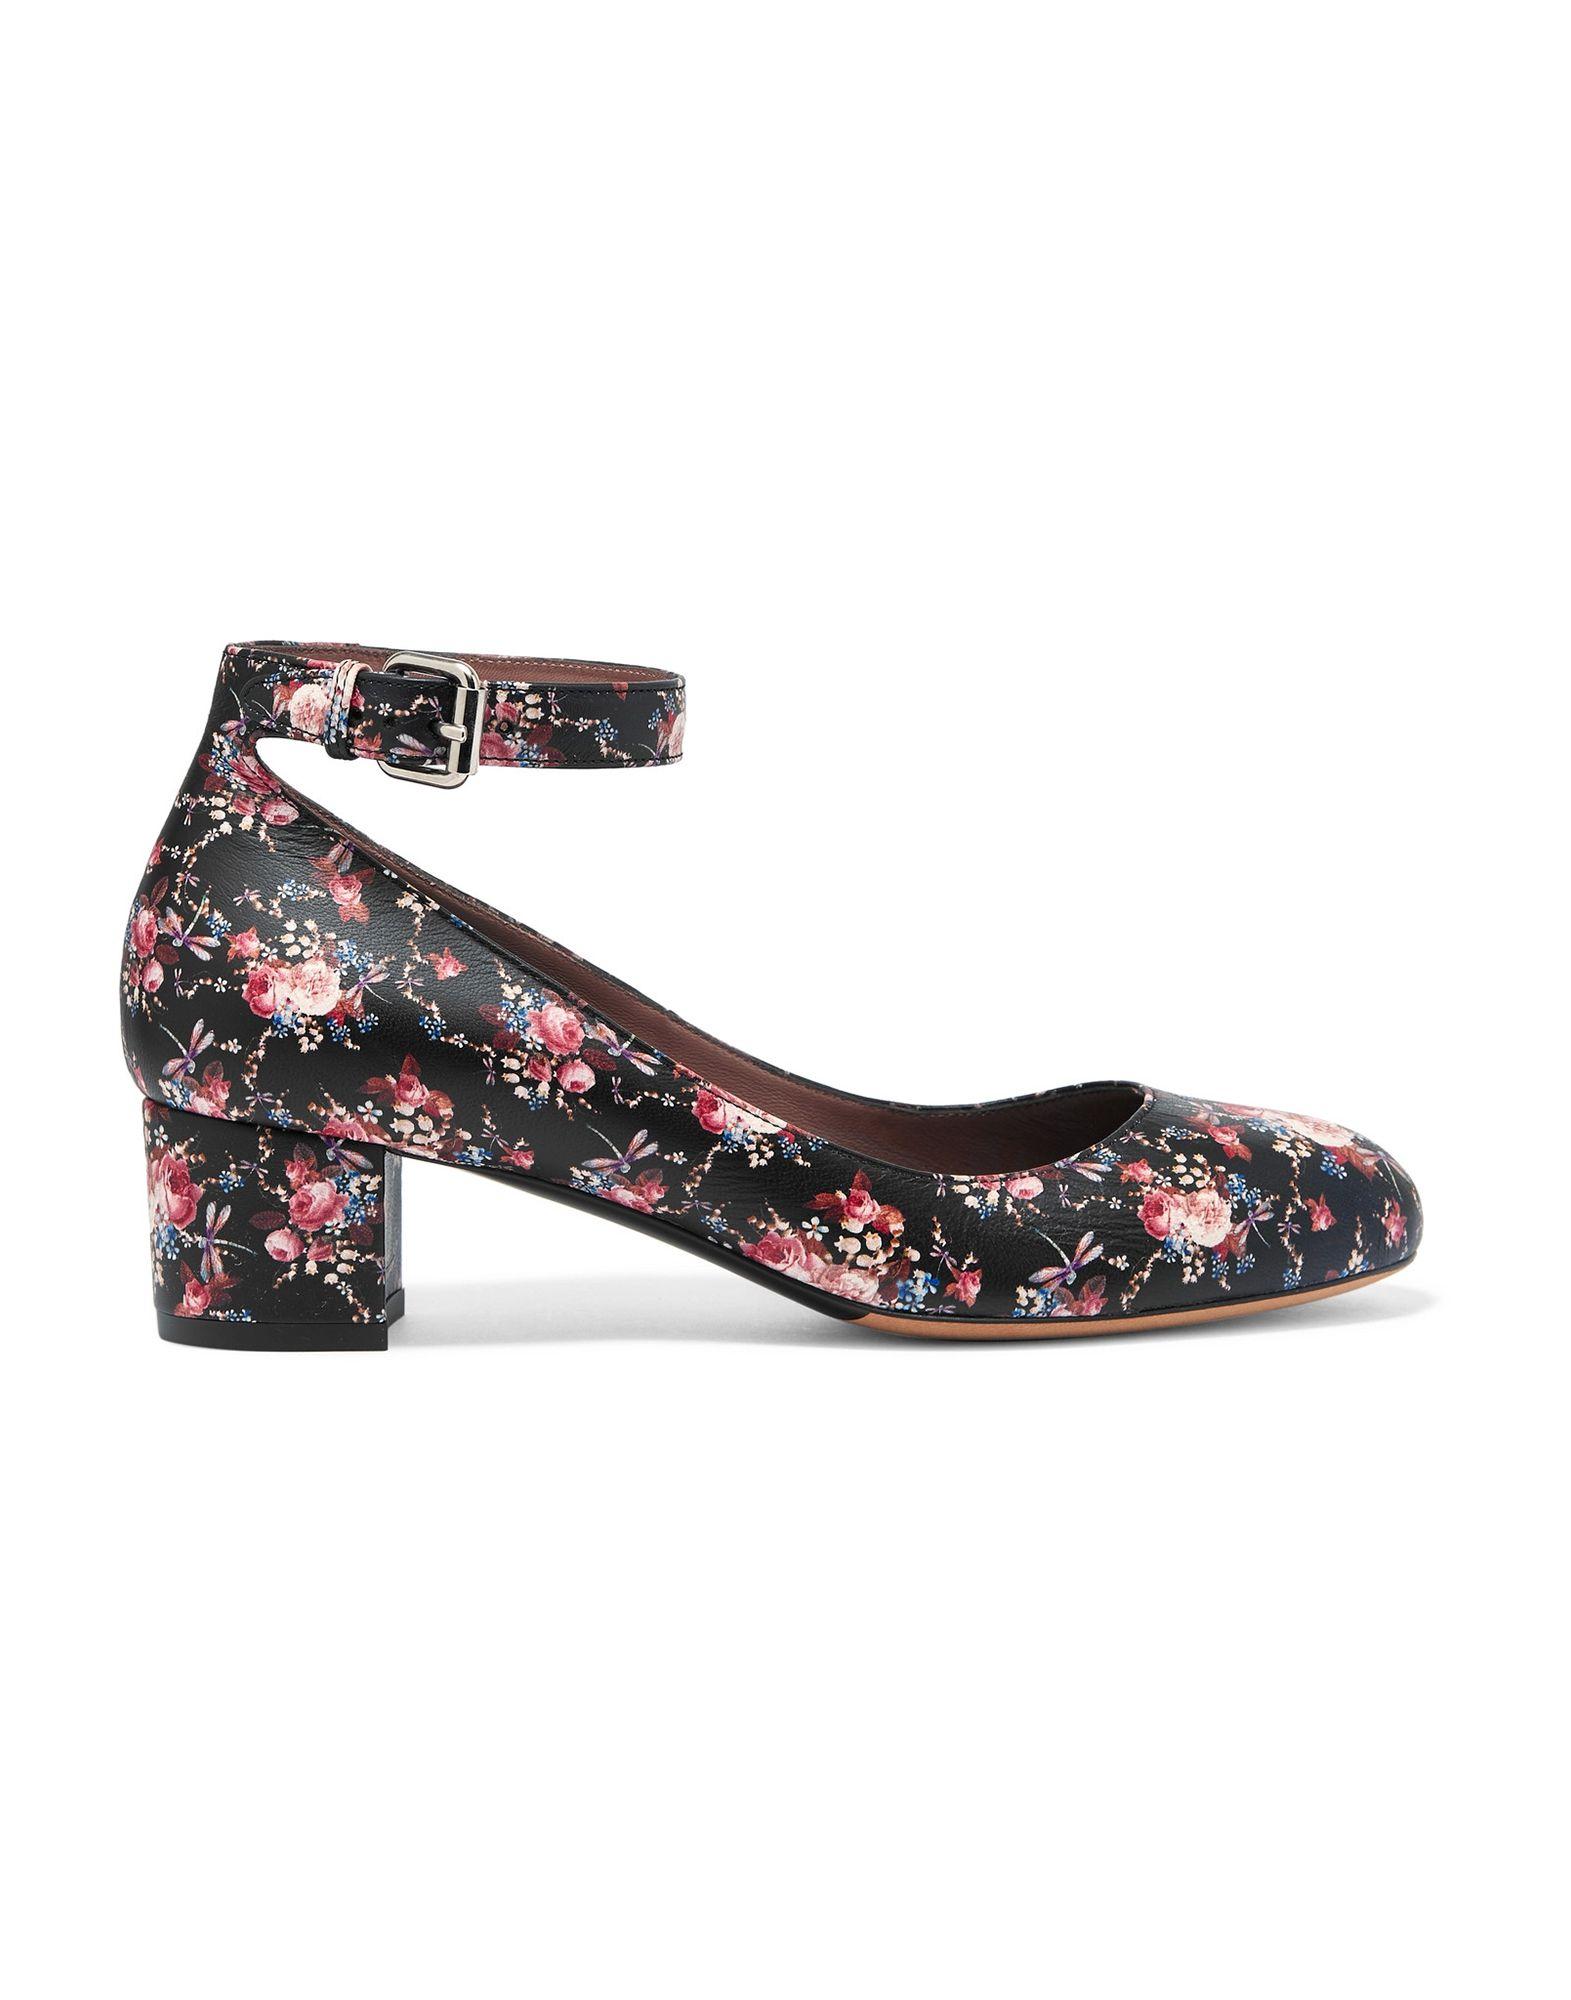 nappa leather, no appliqués, floral design, buckling ankle strap closure, round toeline, square heel